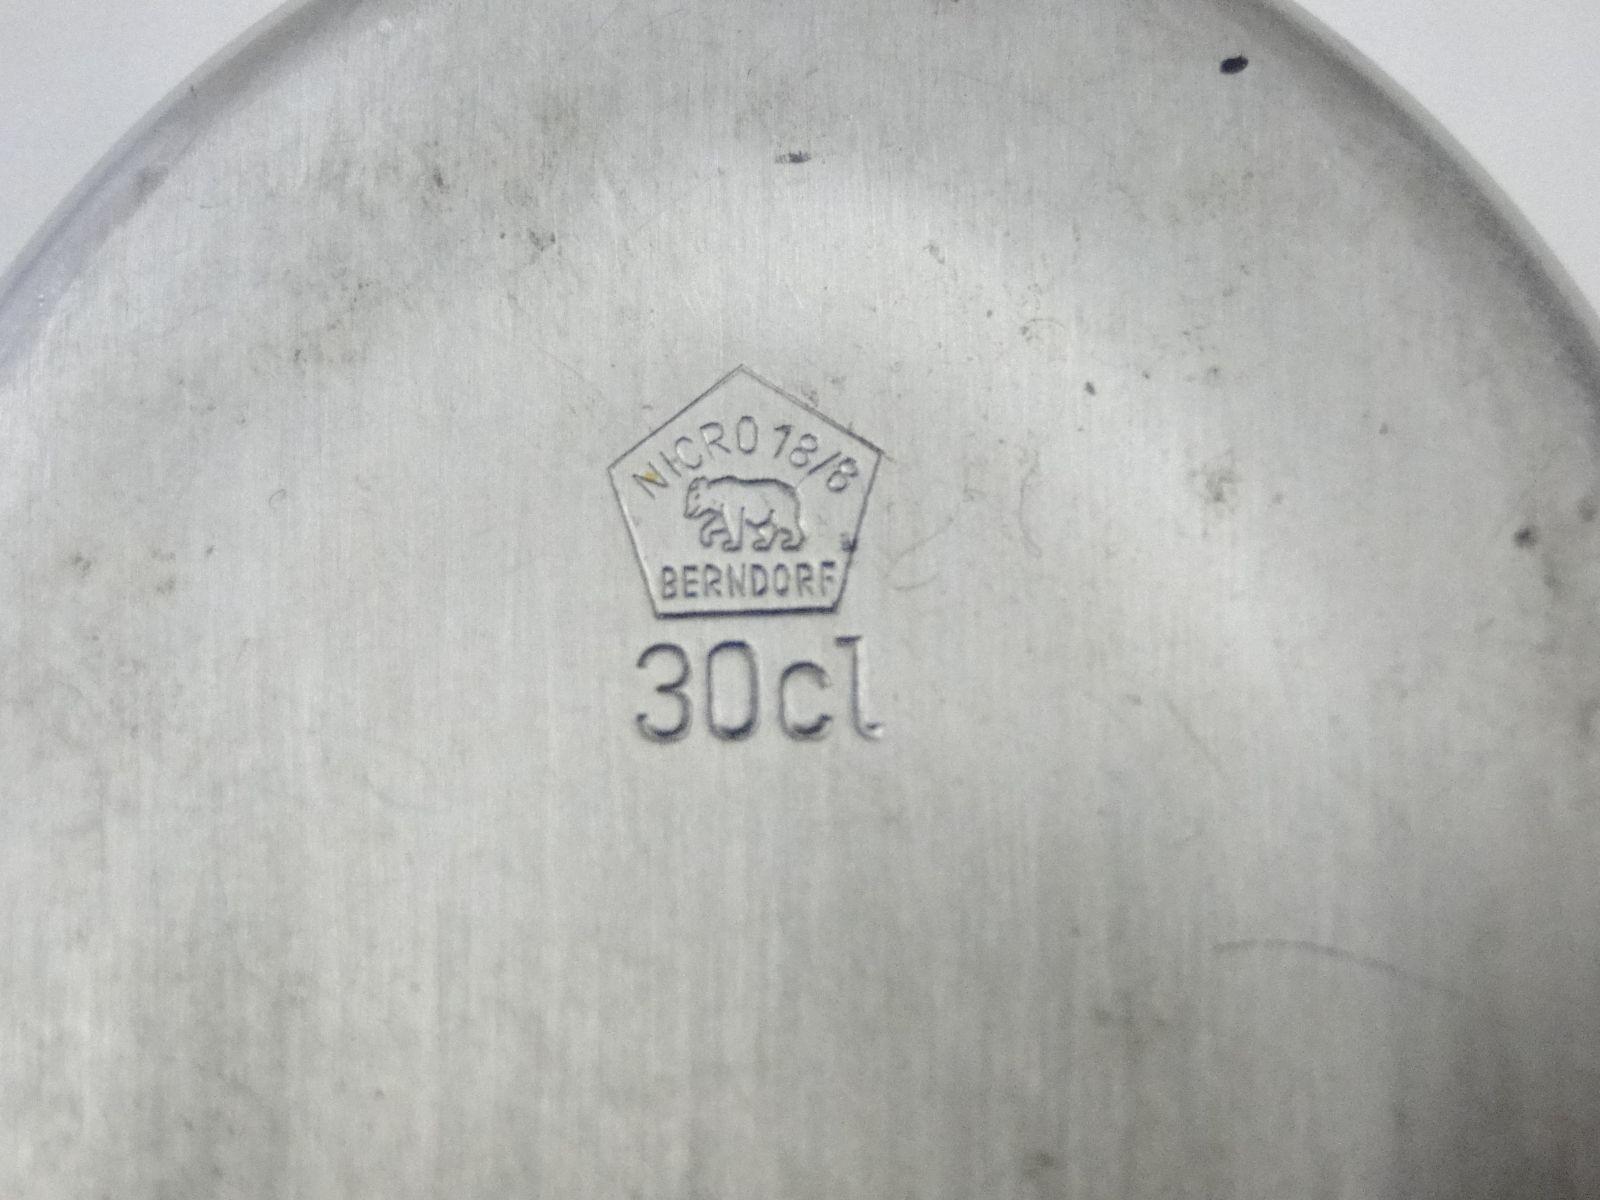 DSC07888.JPG (1600×1200)